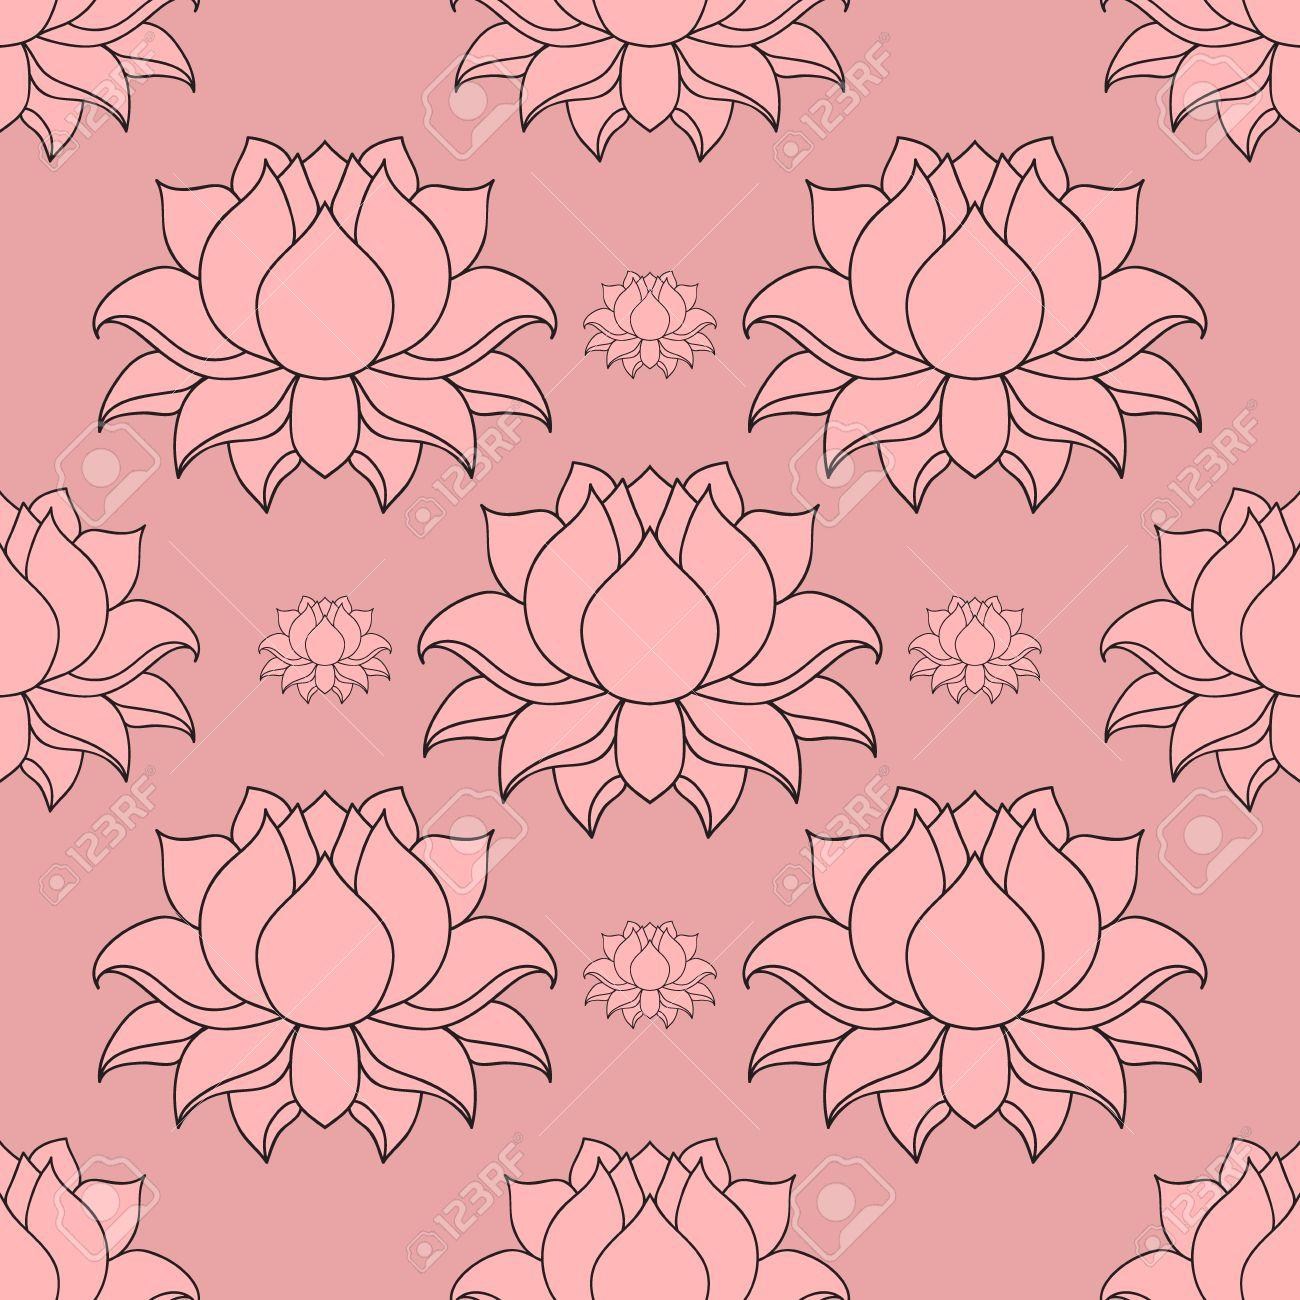 Beautiful detailed lined lotus flower vintage decorative elements beautiful detailed lined lotus flower vintage decorative elements indian hindu motifs seamless pattern dhlflorist Gallery